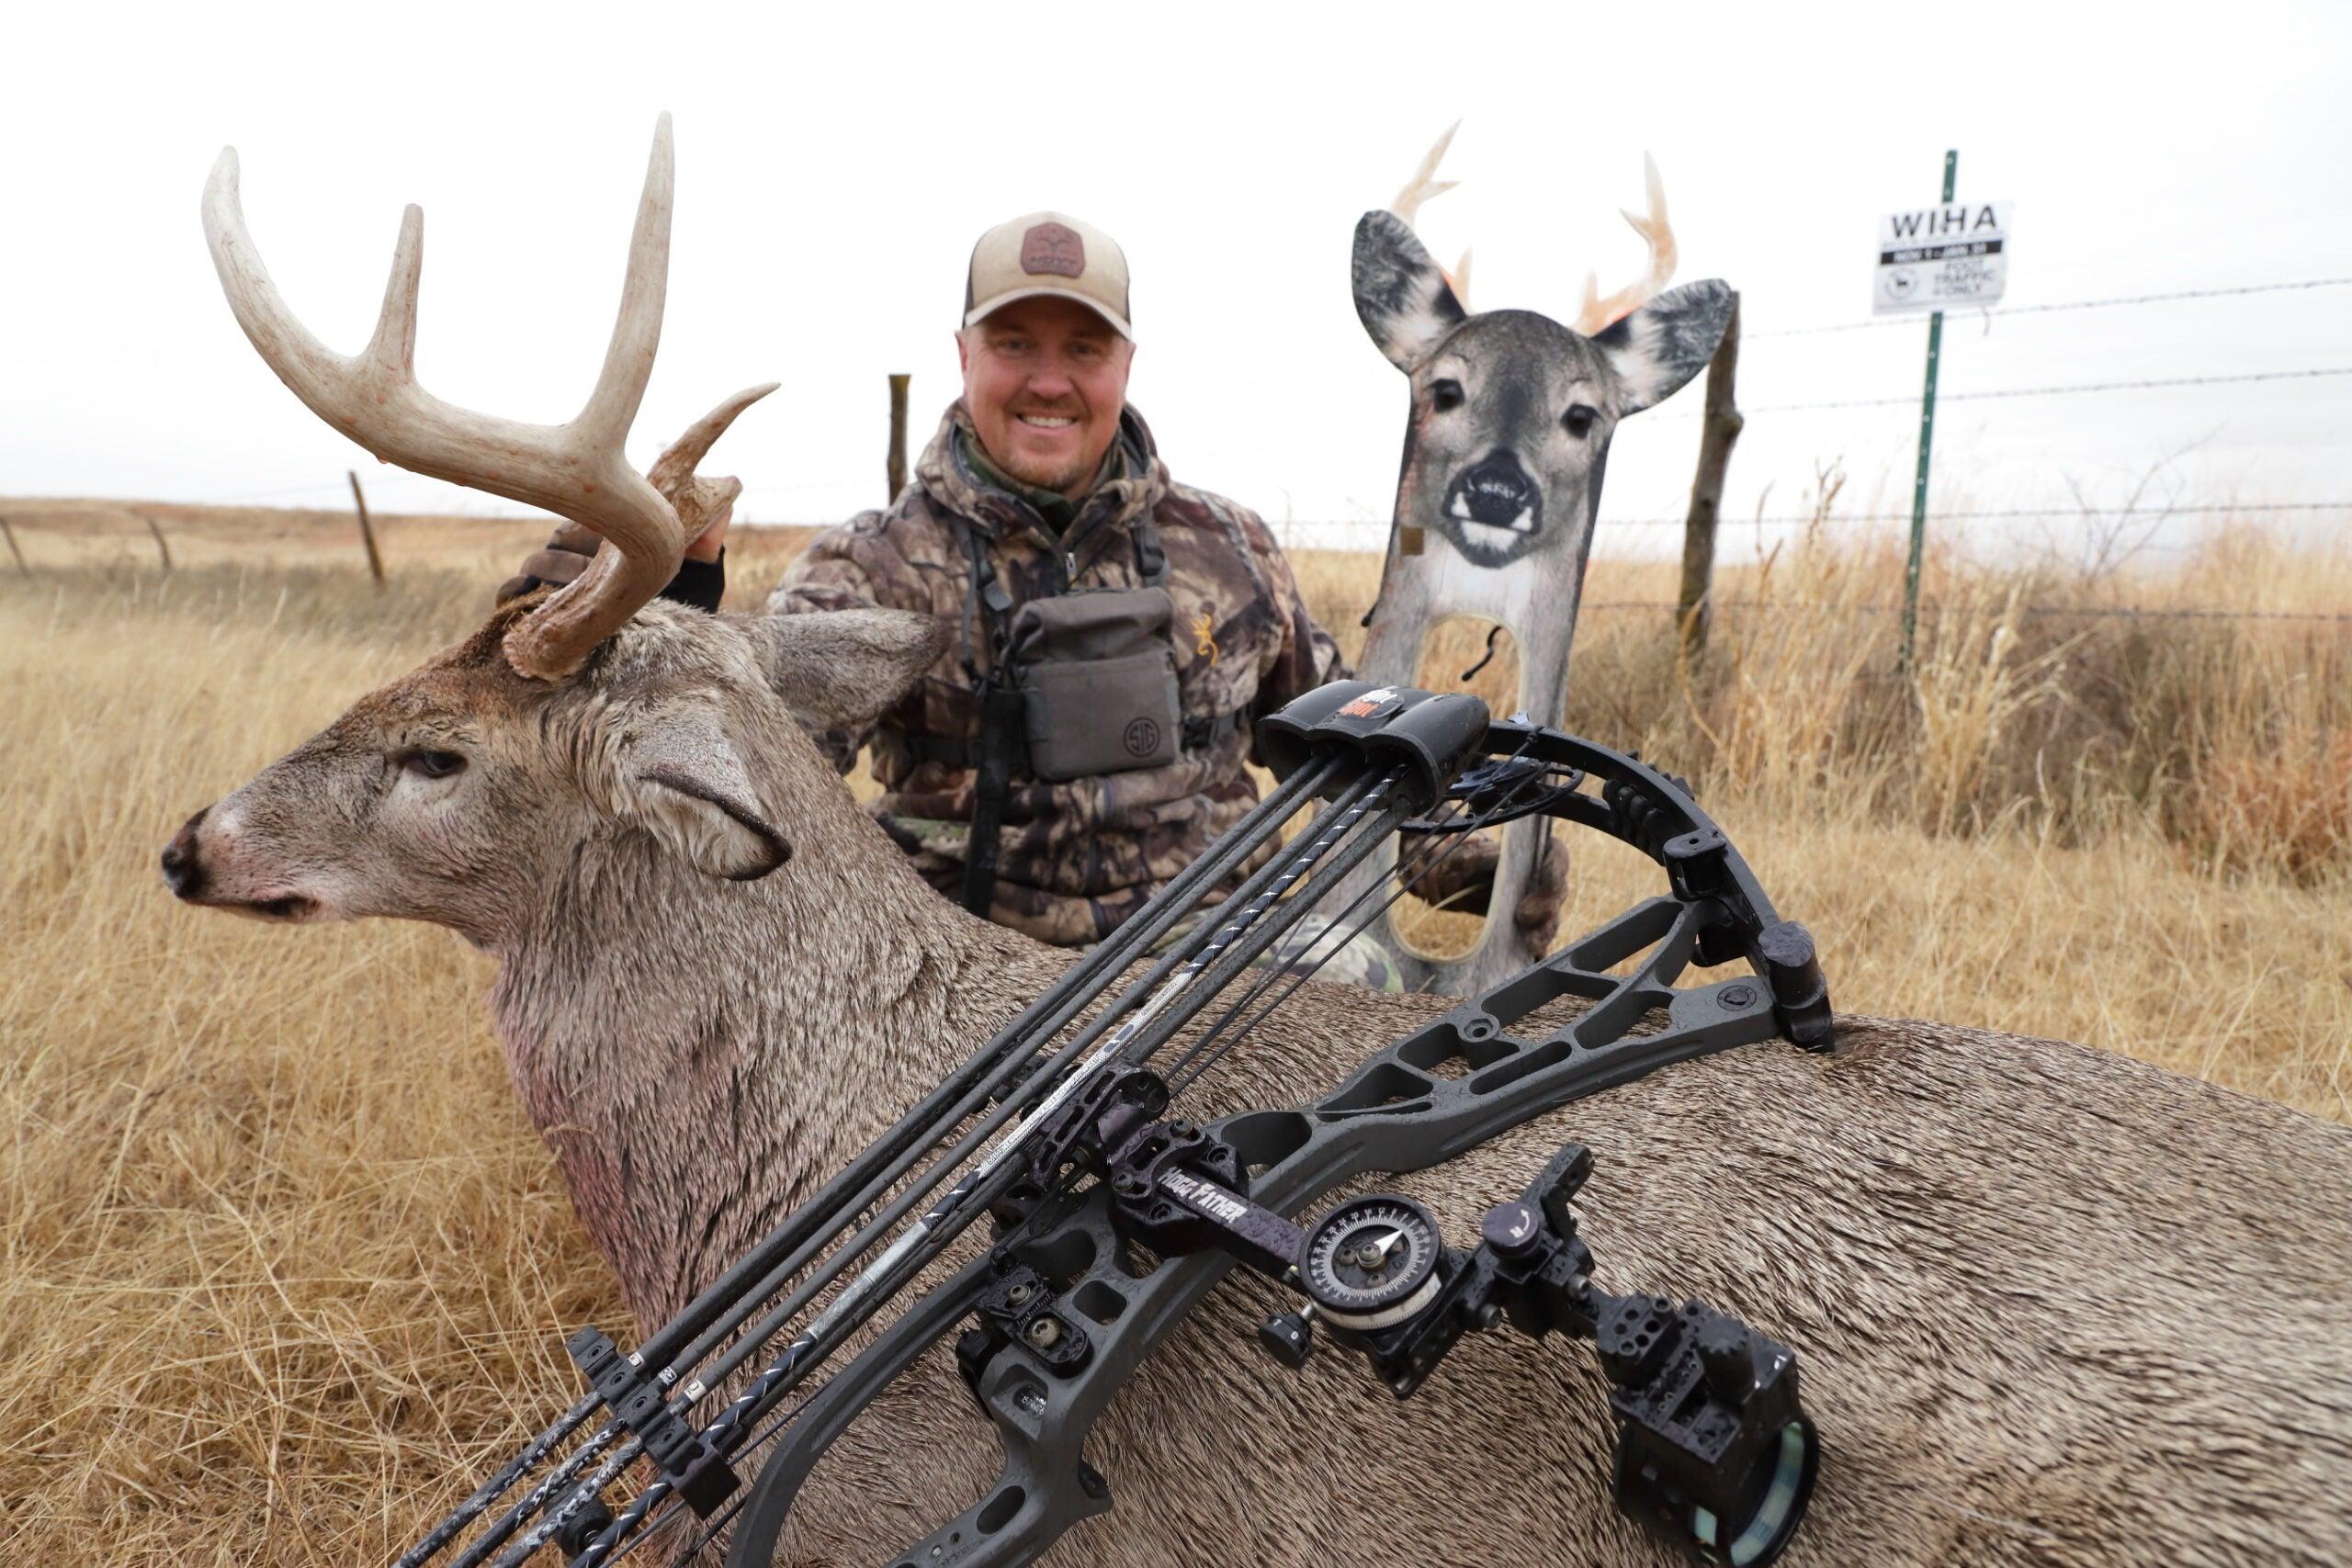 Use a decoy to get closer to big deer.